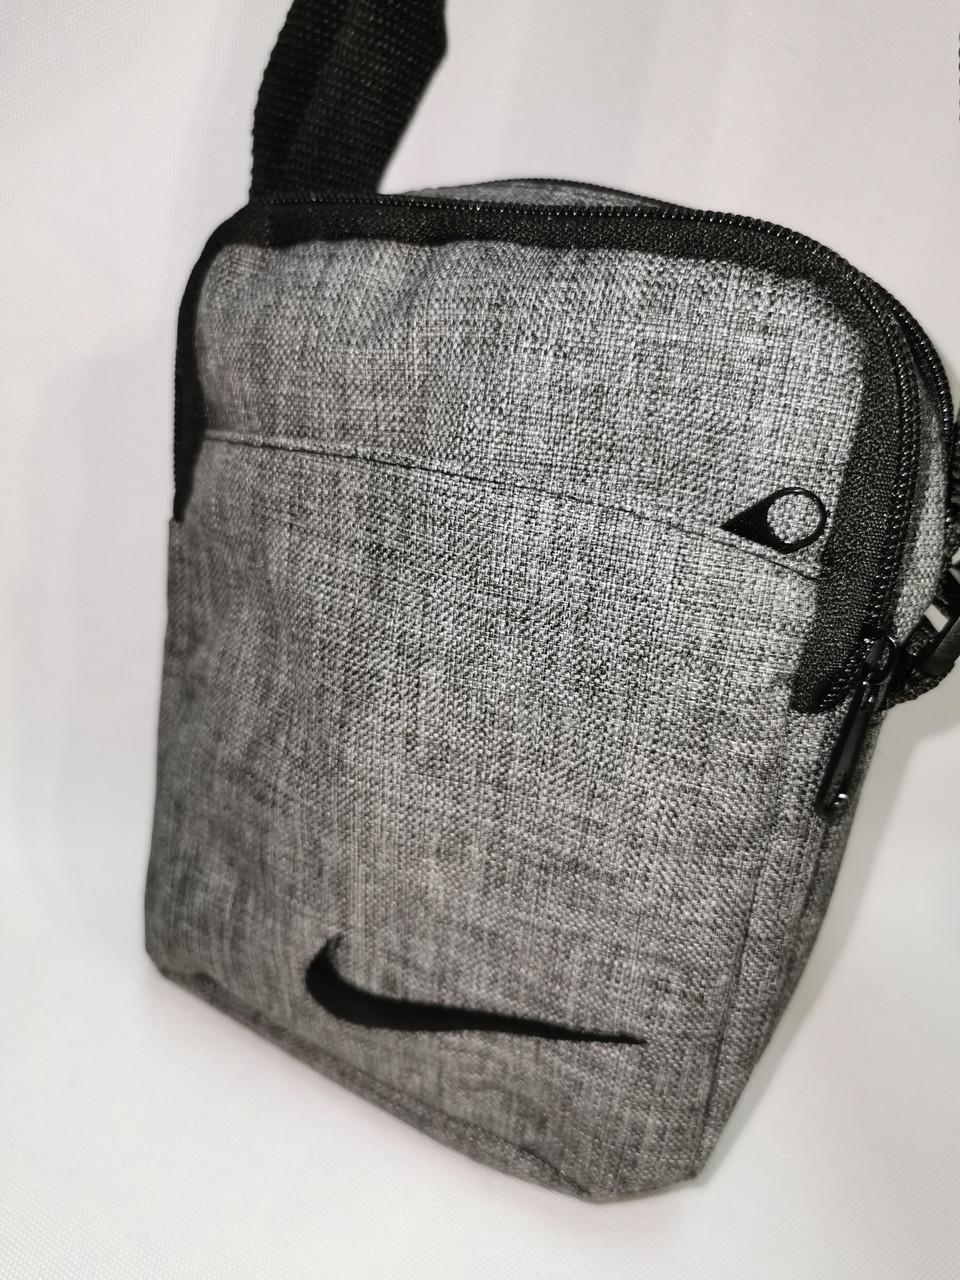 Барсетка nike сумка спортивные мессенджер для через плечо Унисекс ОПТ